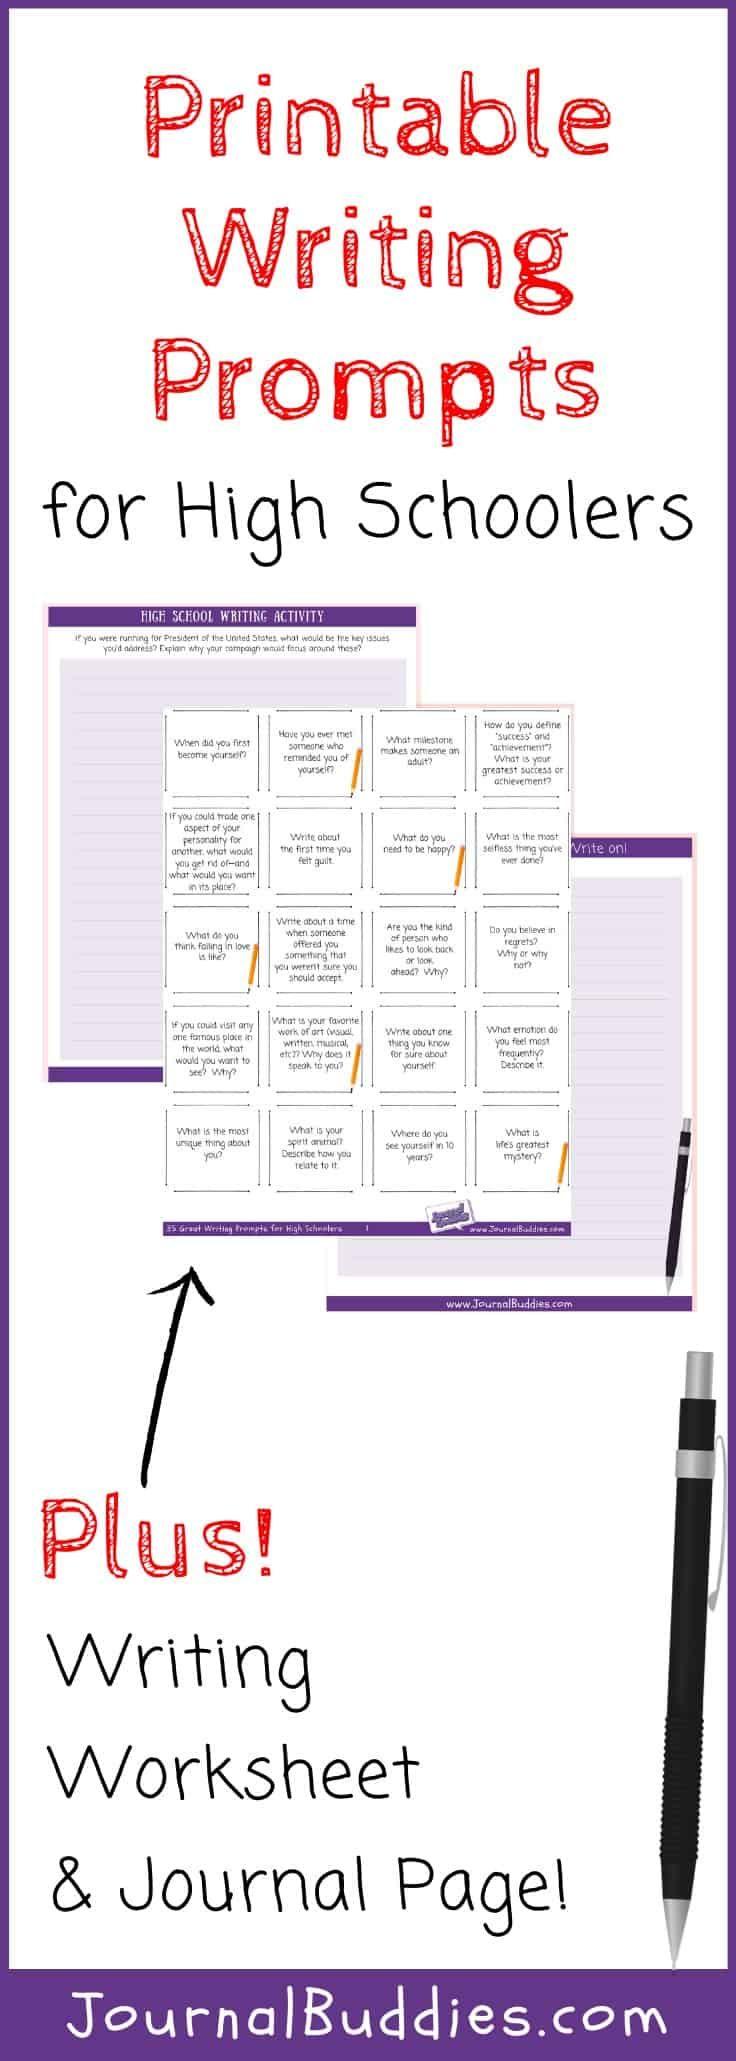 High School Writing Worksheets High School Writing Prompts High School Writing Writing Worksheets [ 2061 x 736 Pixel ]